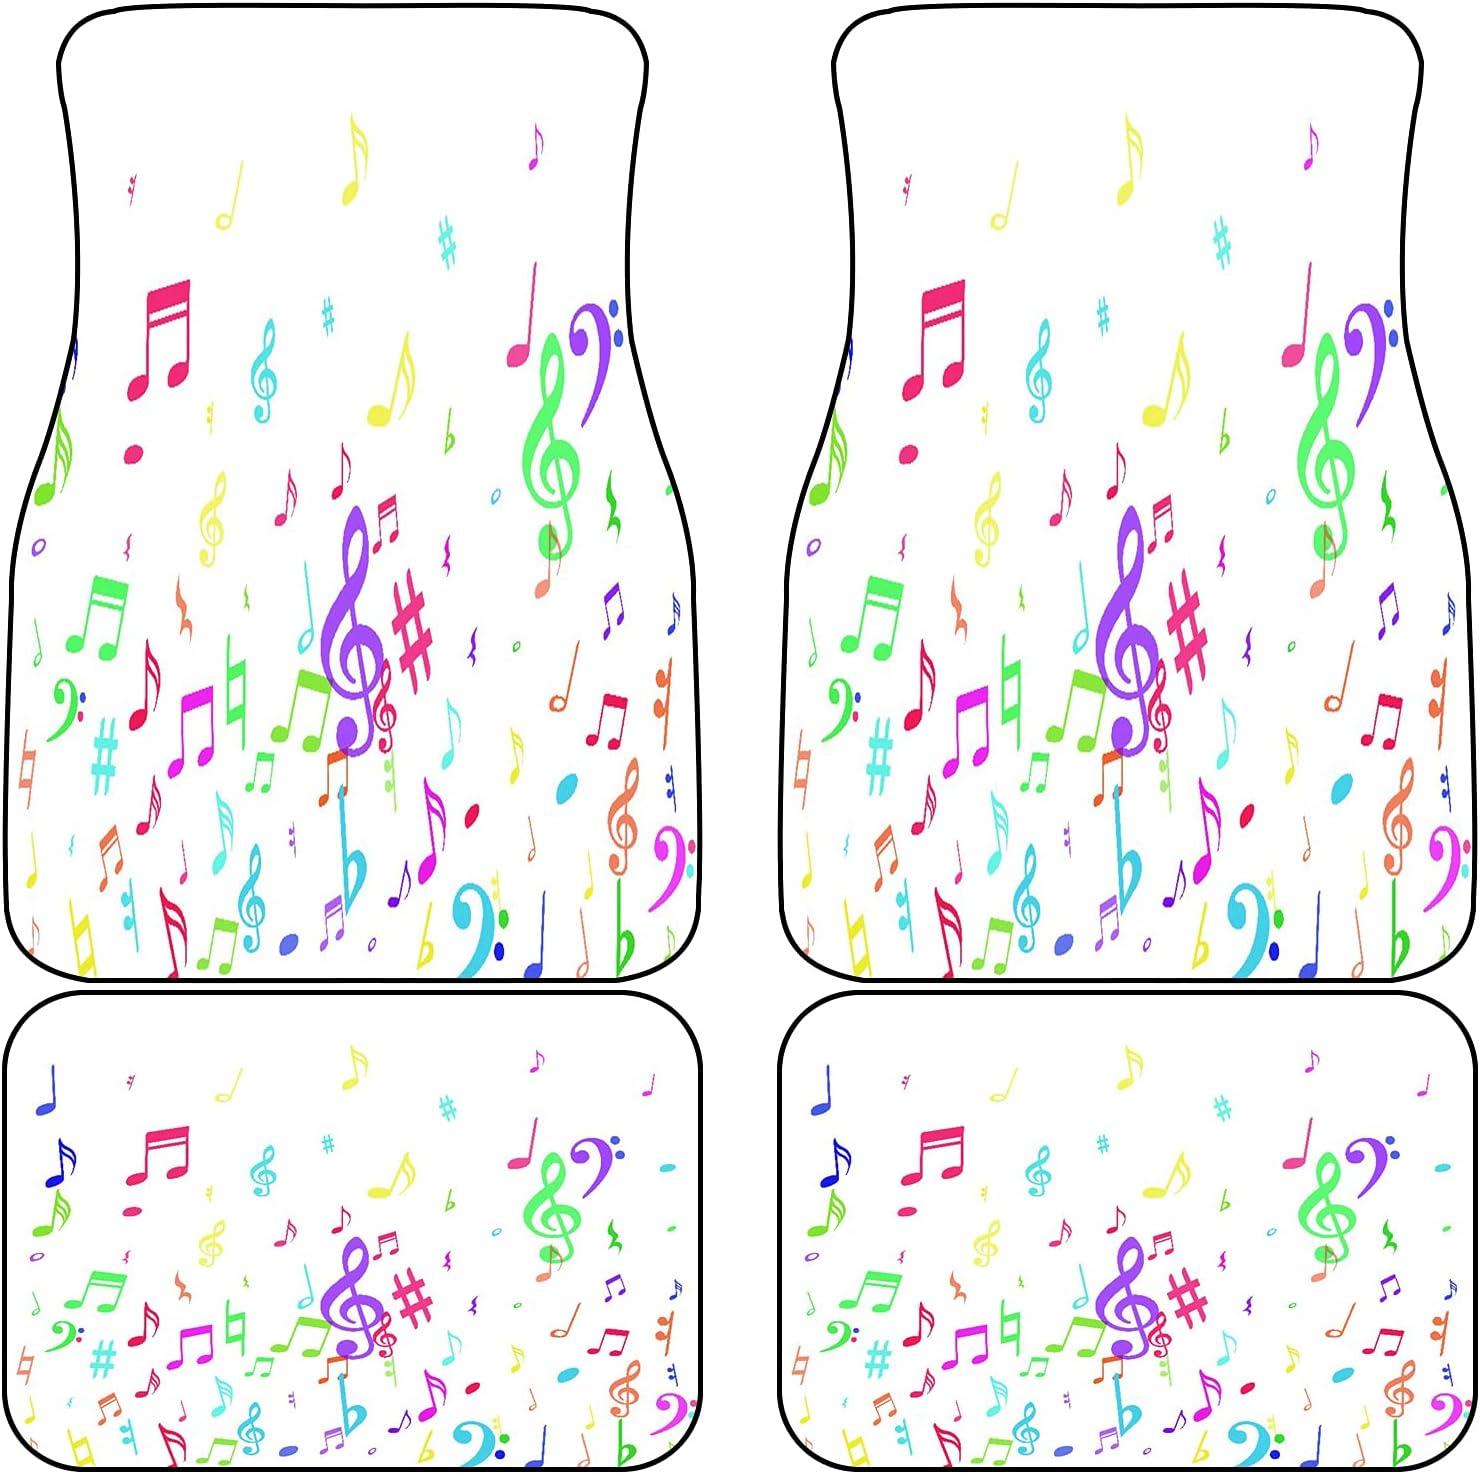 VINISATH Front Rear Over item handling Ranking TOP6 Car Mats Set Colorful Flying Musical 4 of